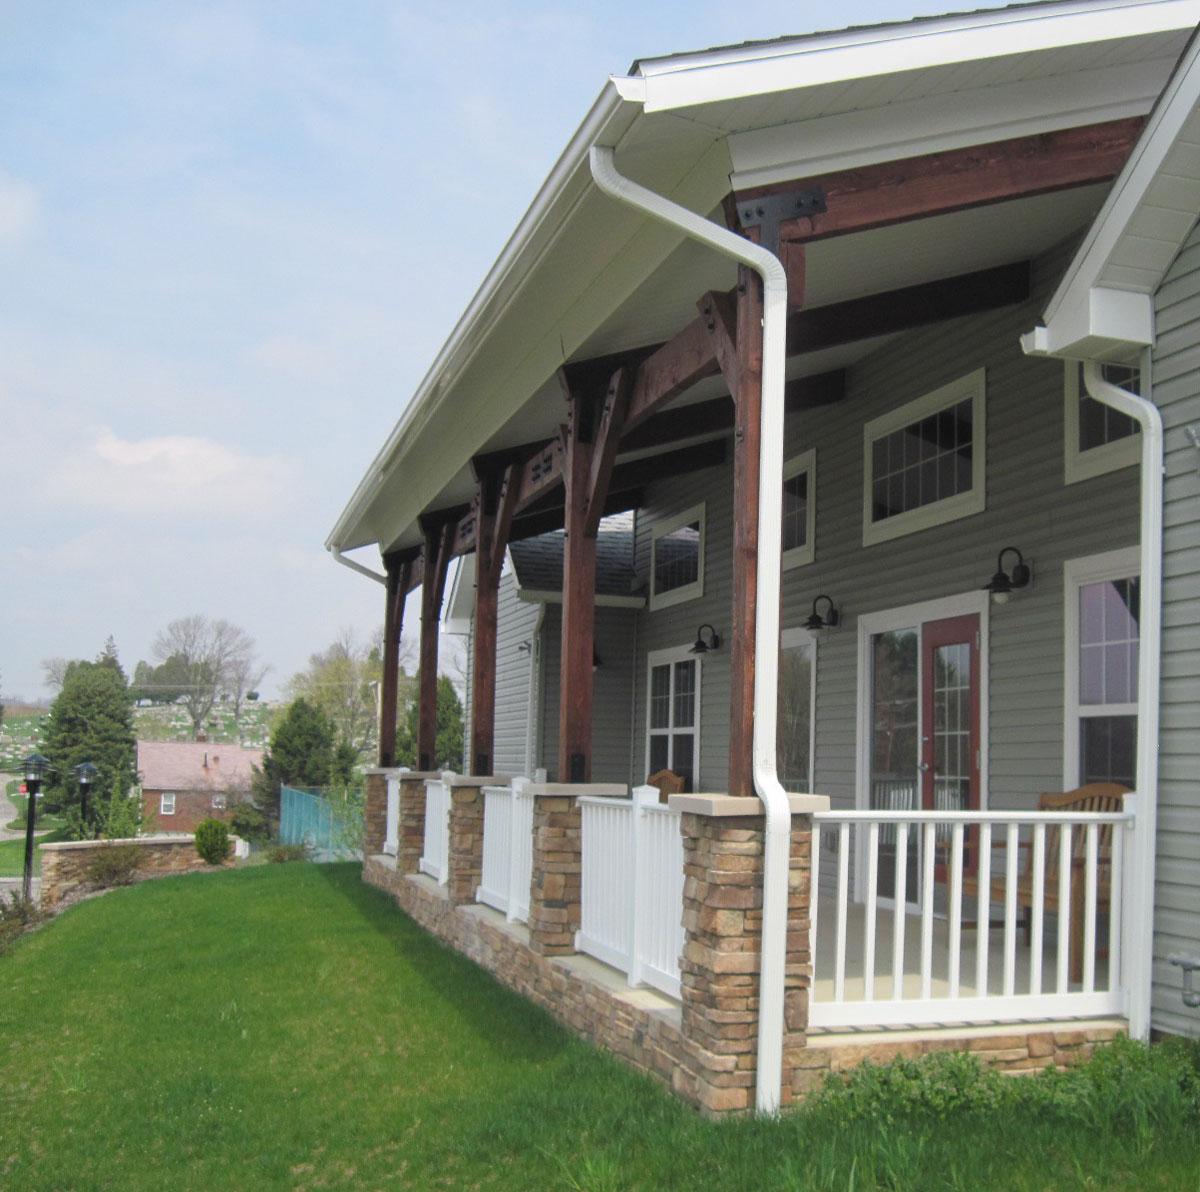 Grandview Pointe Apartments: Grandview Pointe: Blairsville, PA